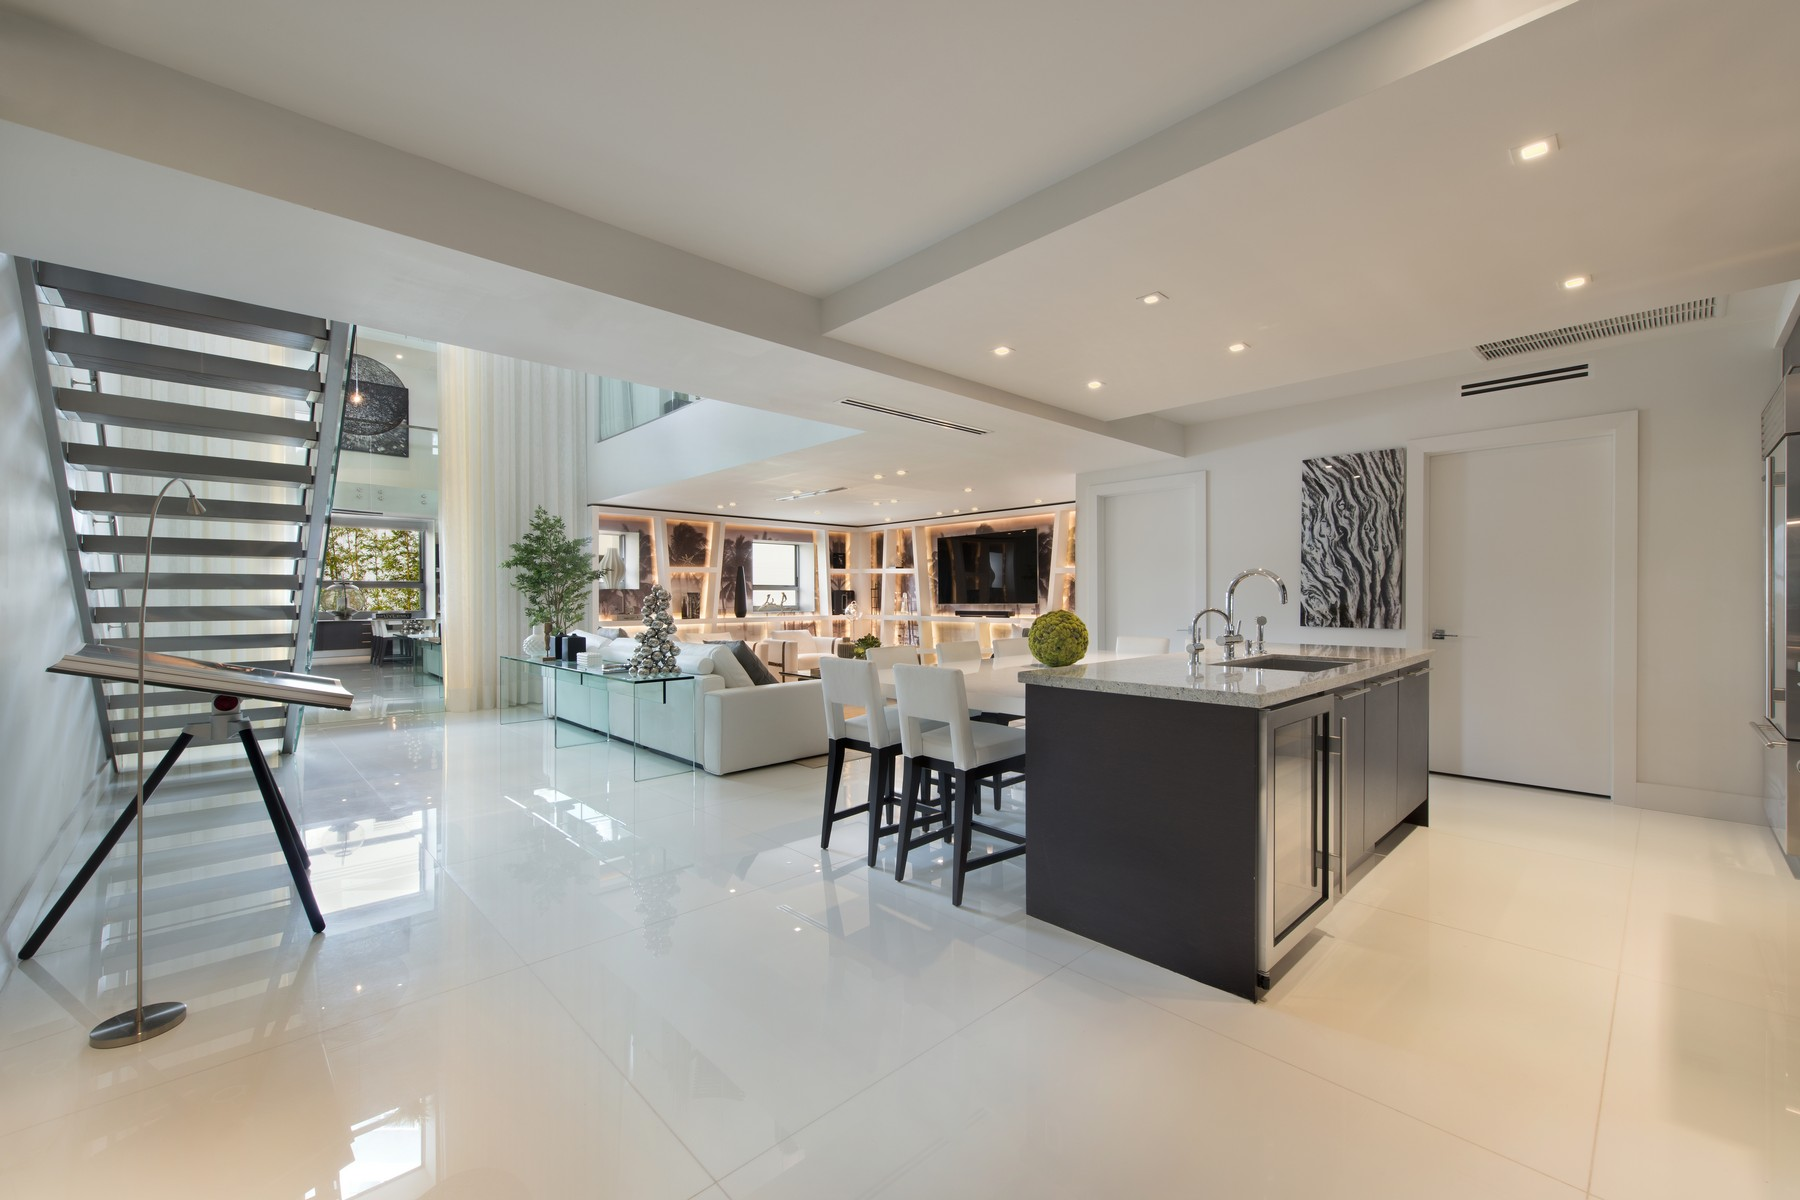 Nhà chung cư vì Bán tại 125 Ocean Dr #F201 Miami Beach, Florida 33139 Hoa Kỳ